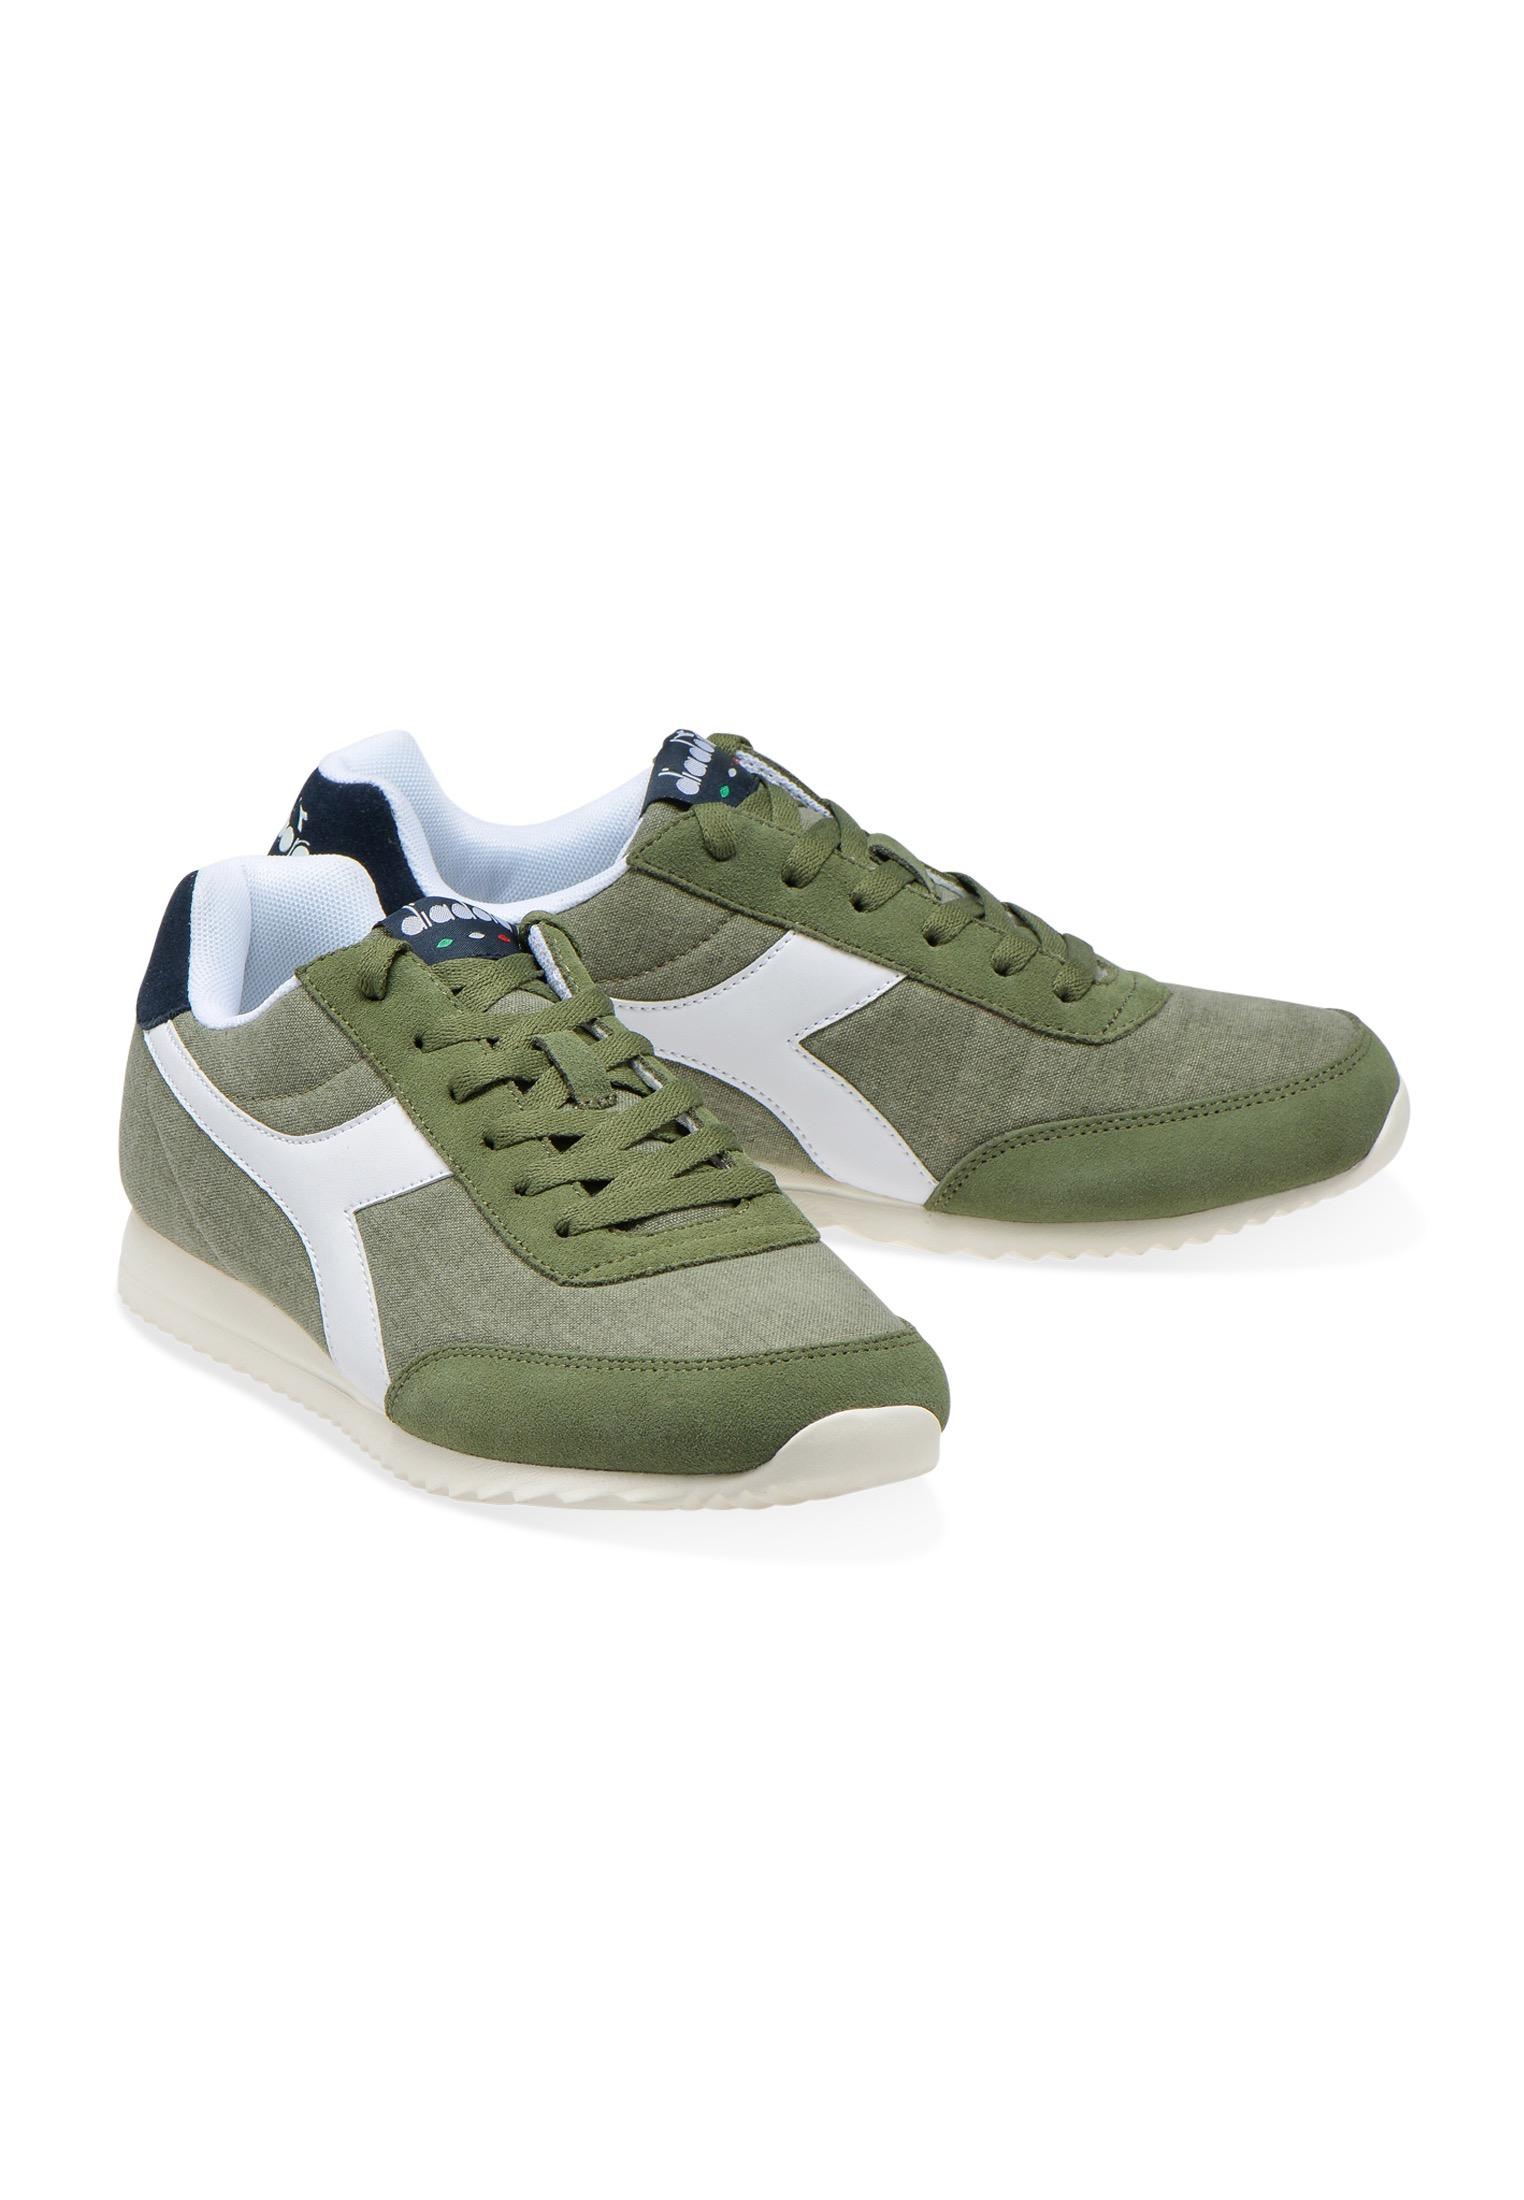 Scarpe-Diadora-Jog-Light-C-Sneakers-sportive-uomo-donna-vari-colori-e-taglie miniatura 65